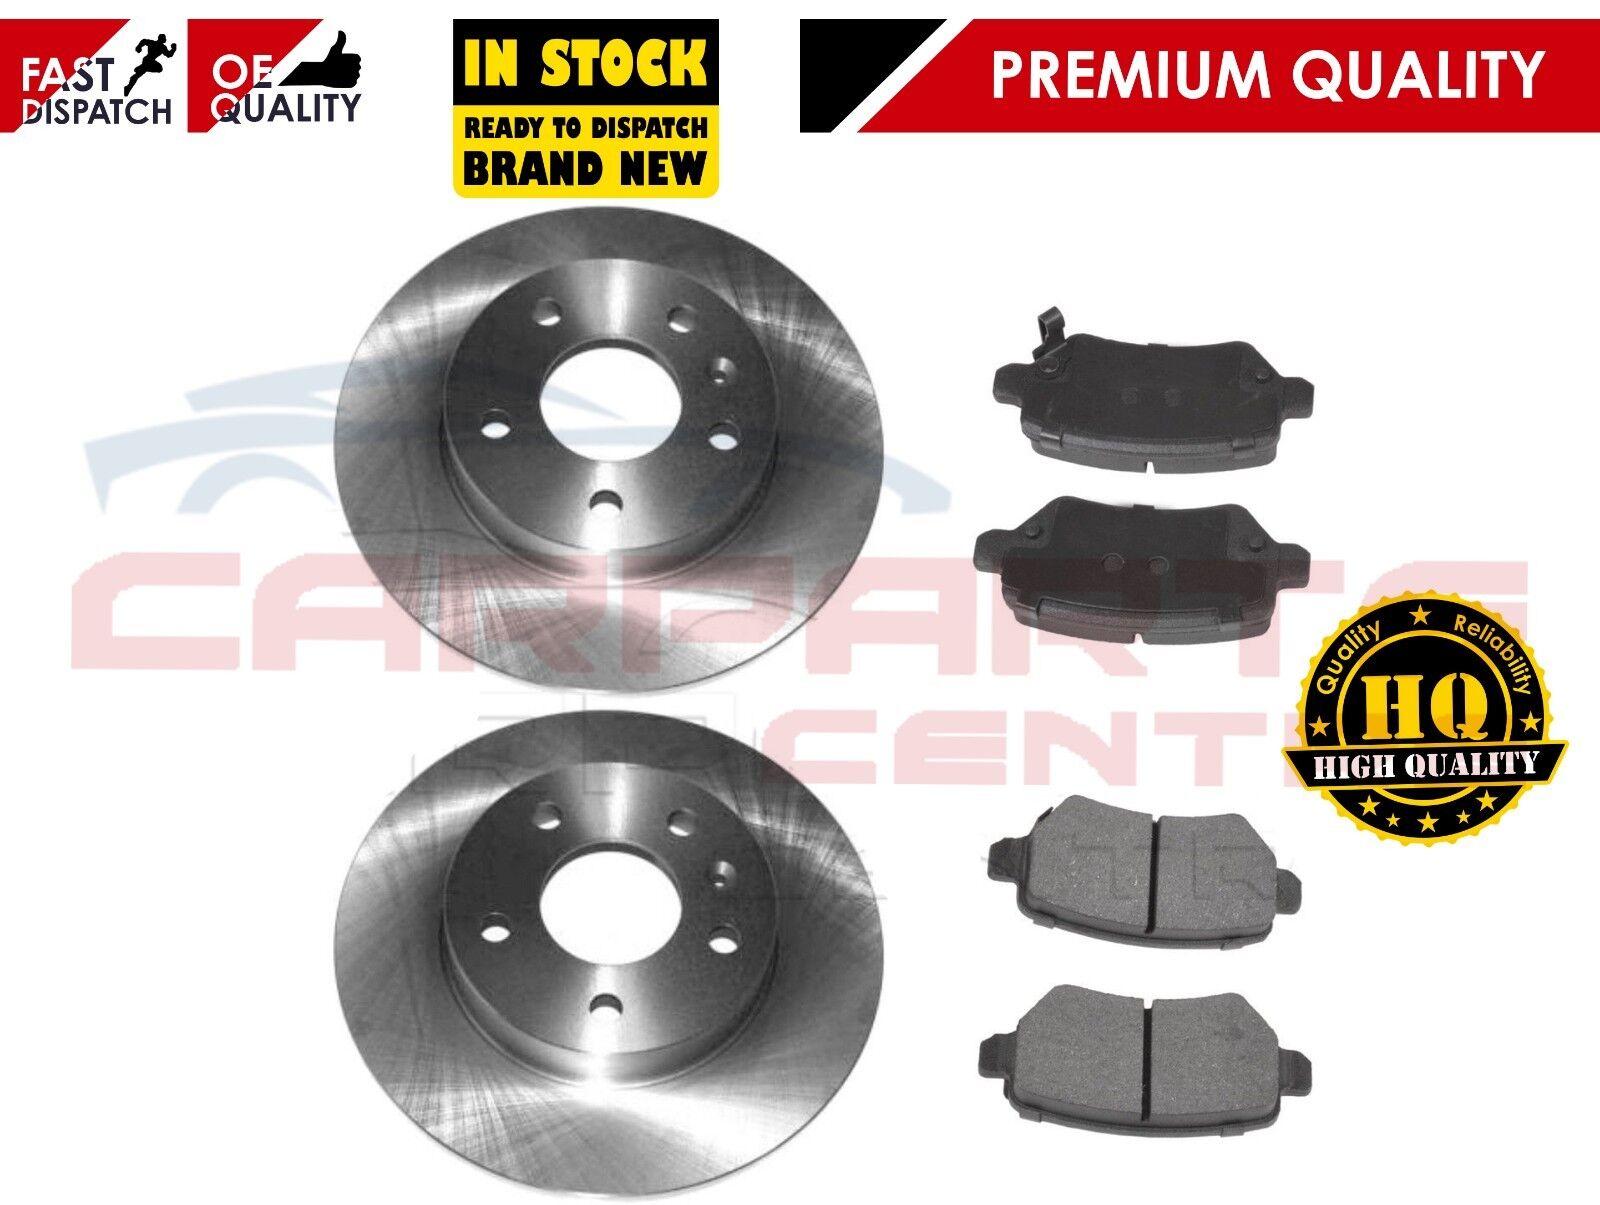 Vauxhall Rear Brake Pads Brake Discs Full Axle Set 264mm Solid Fits Opel